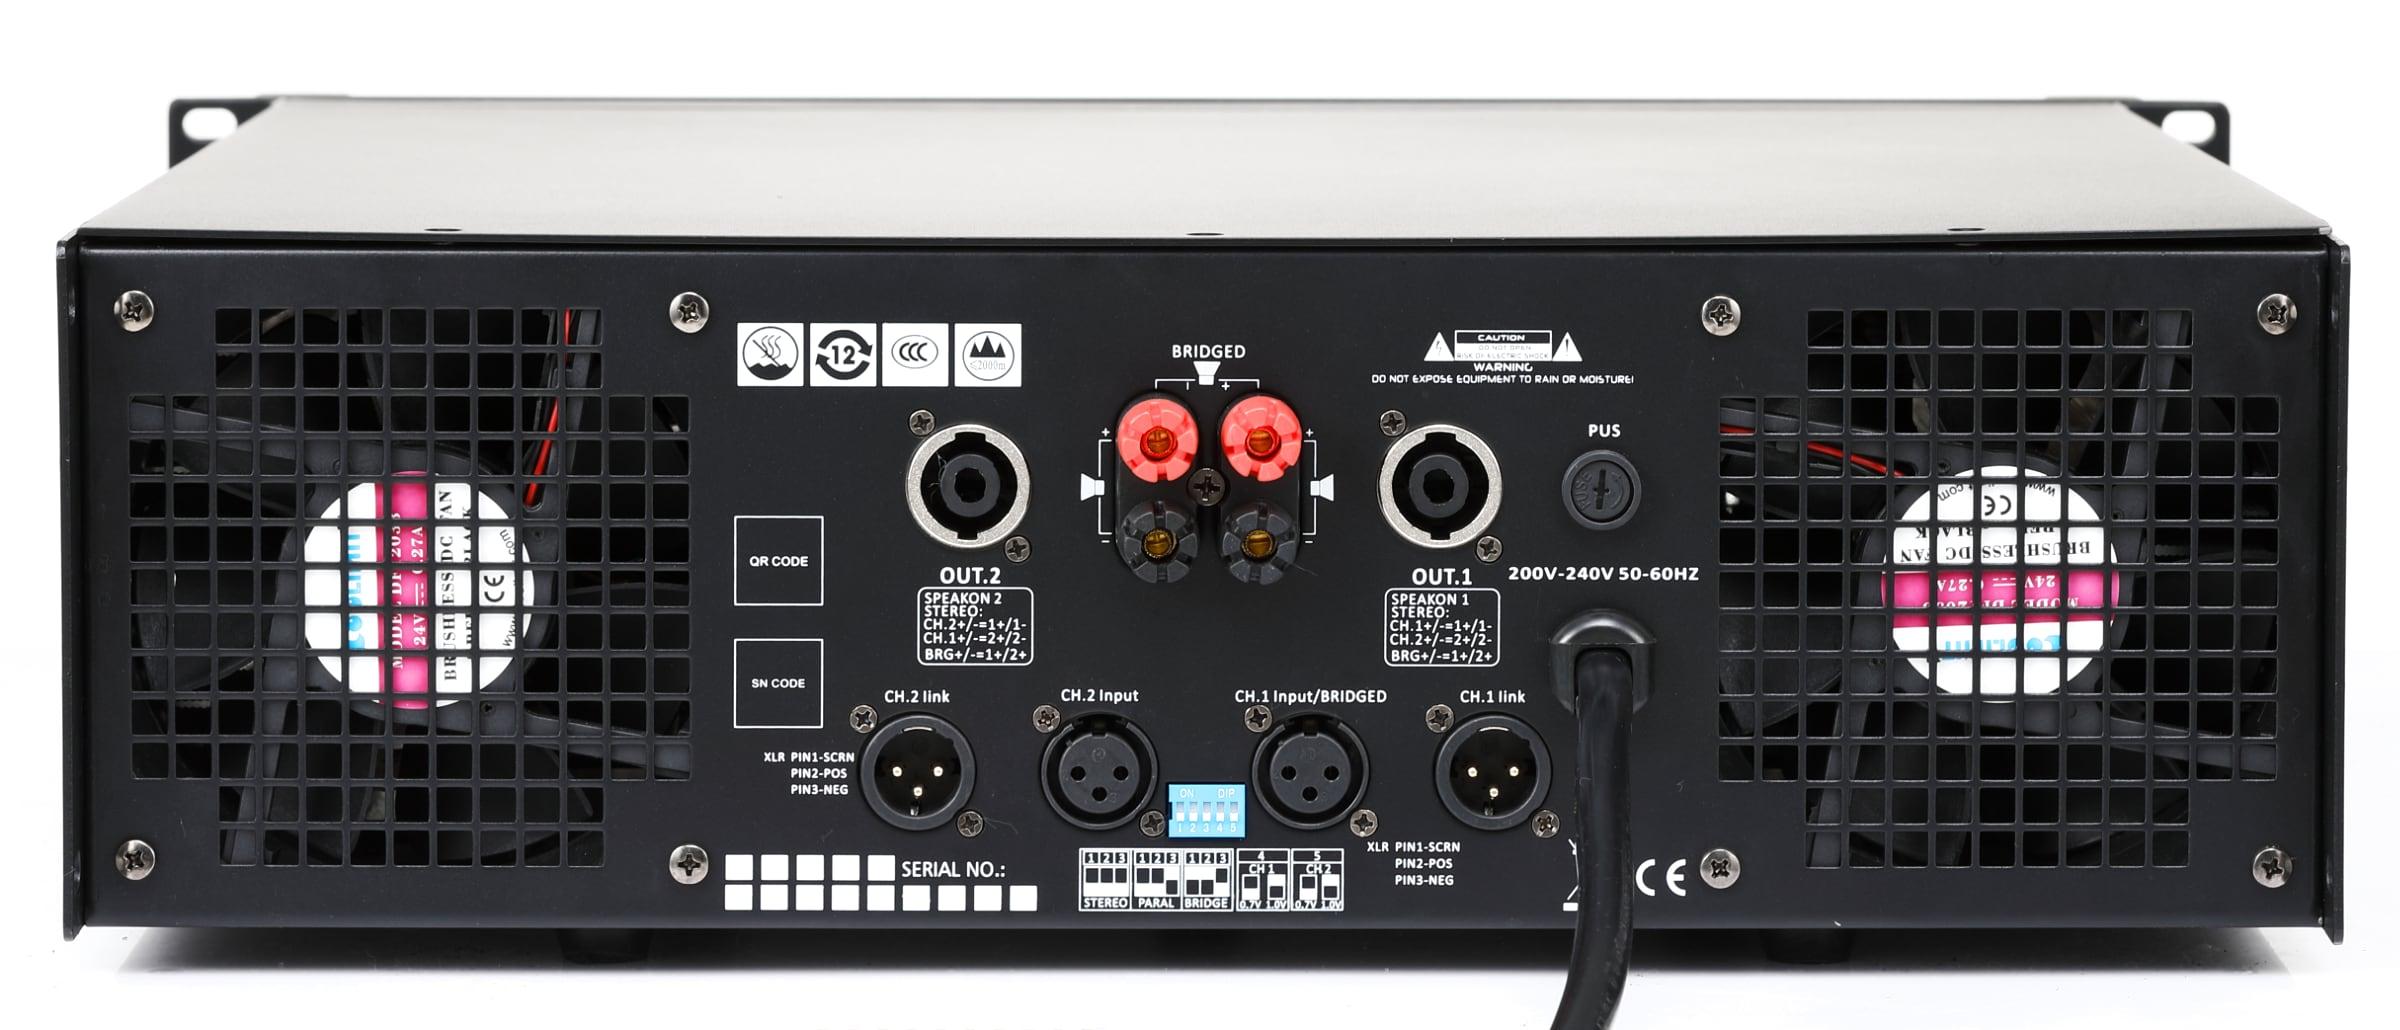 VCông suất AAP DX-20002